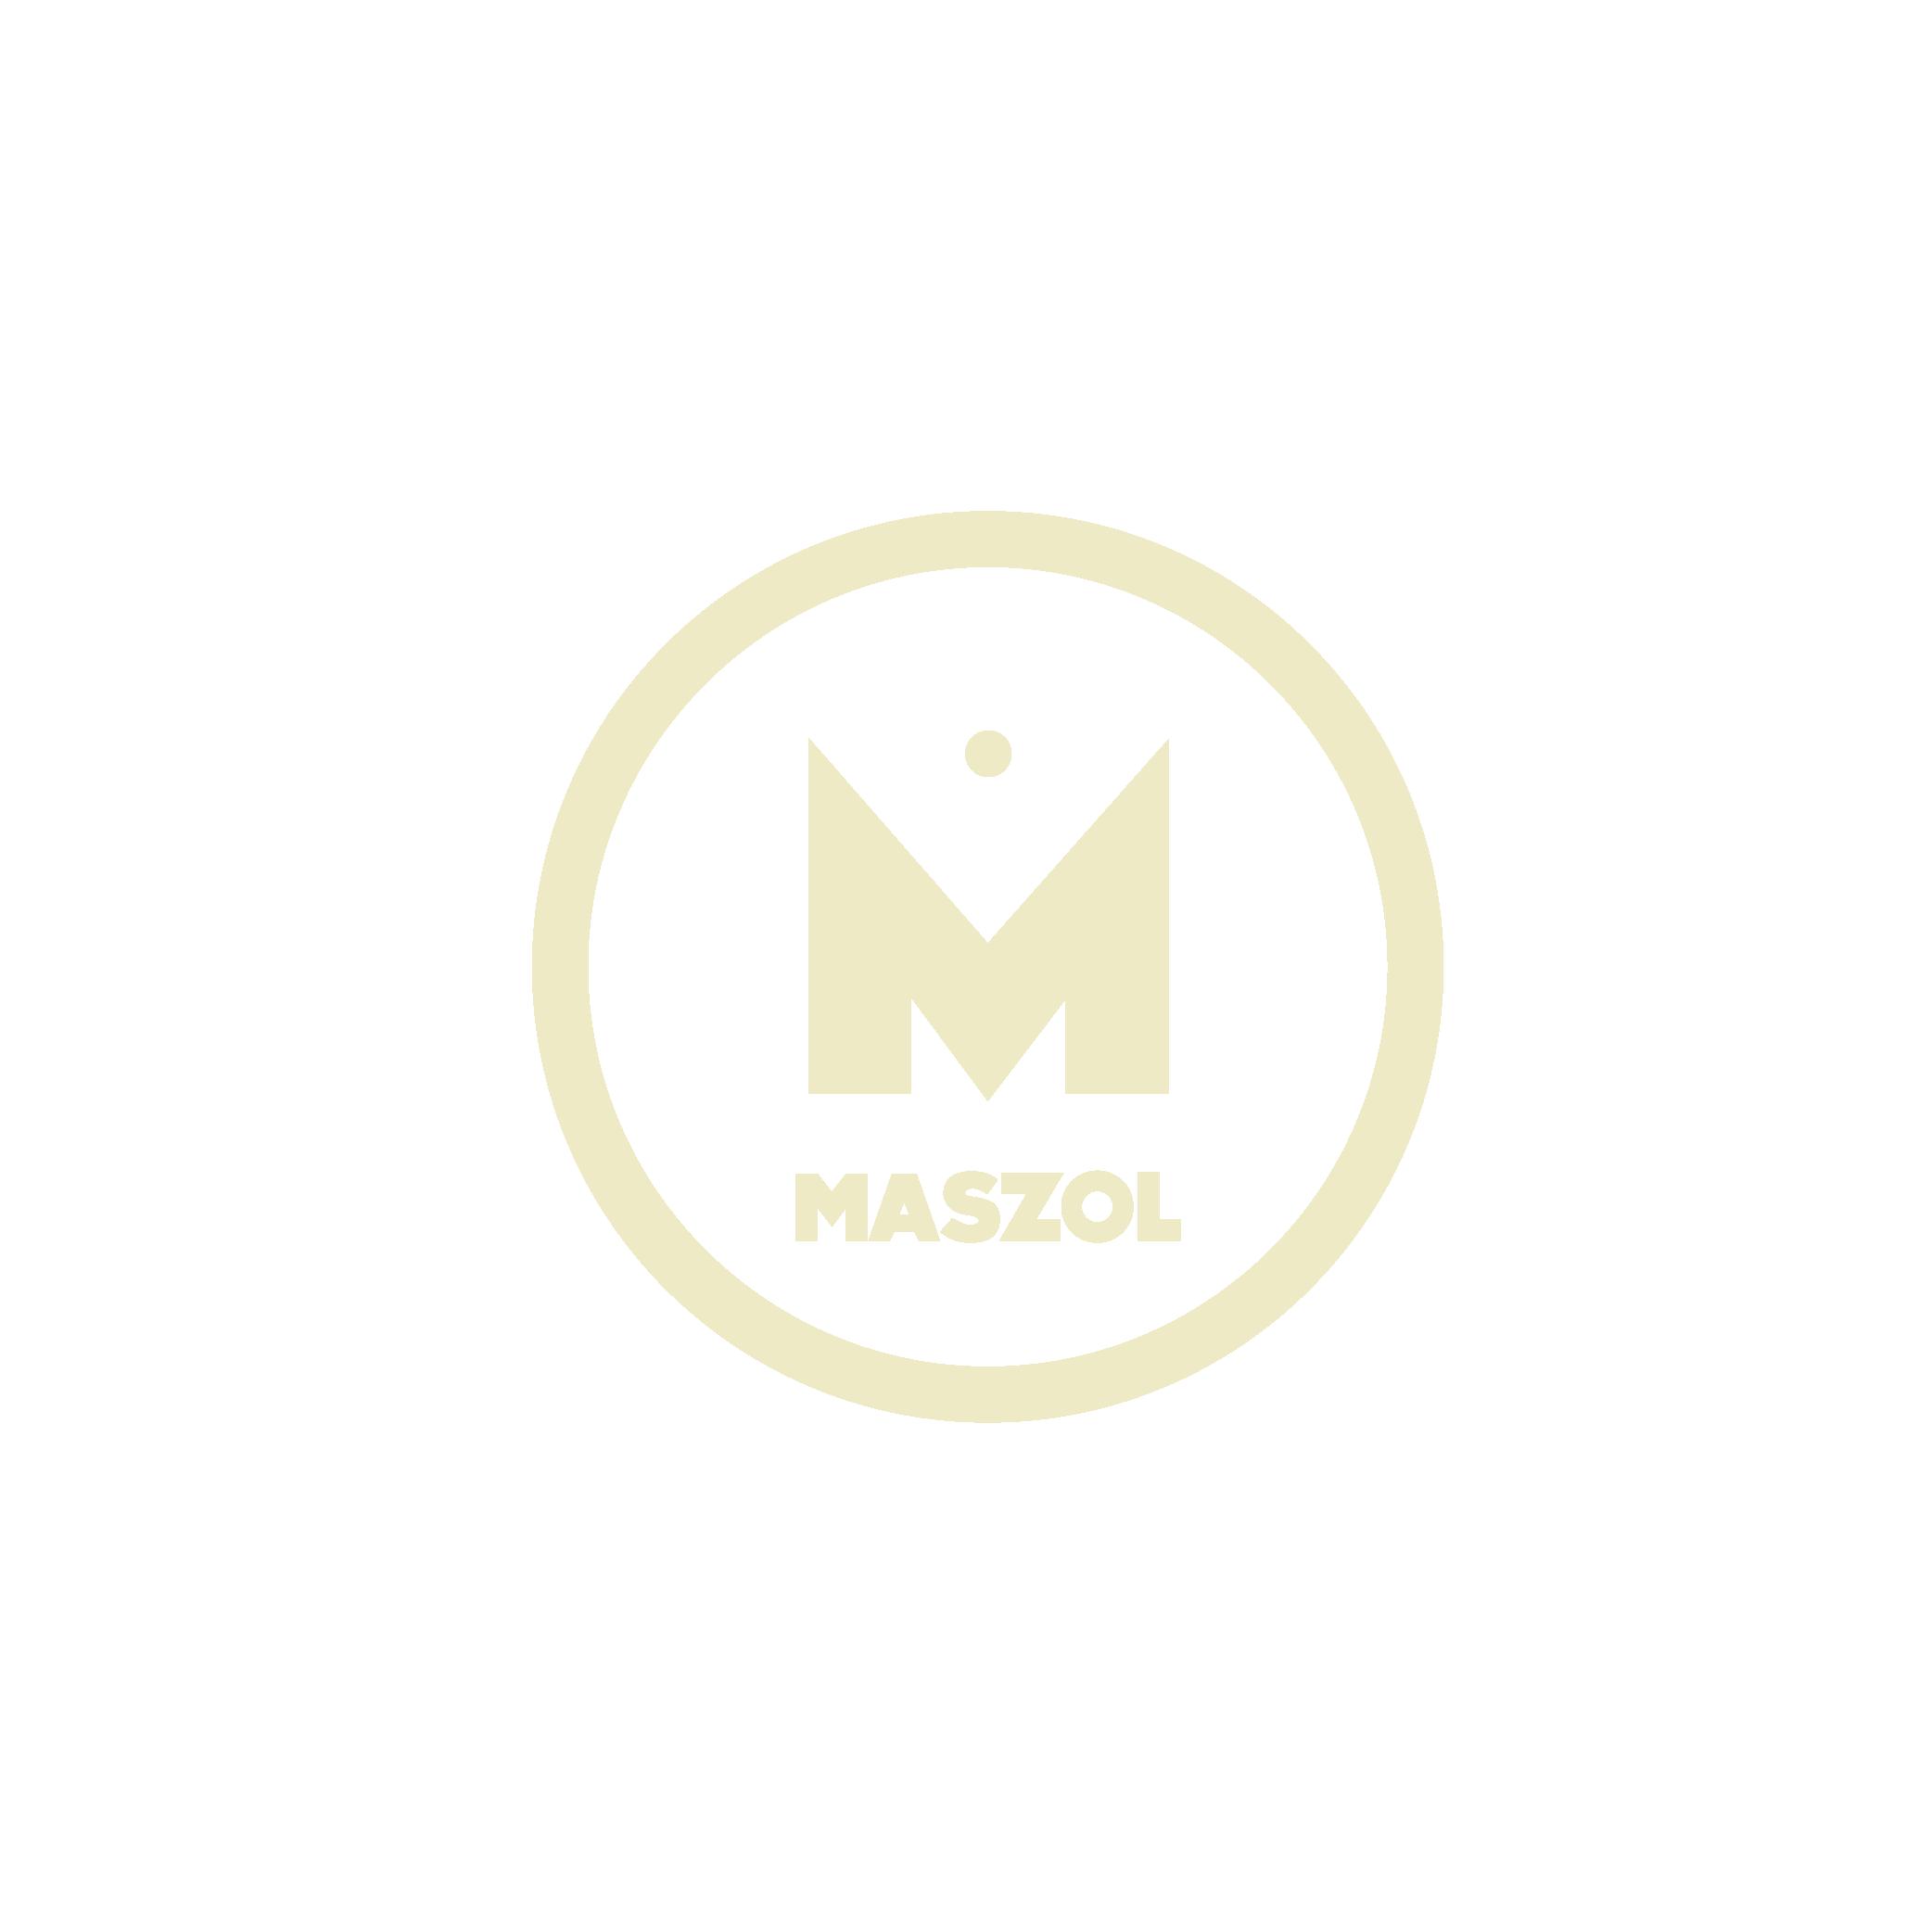 maszol